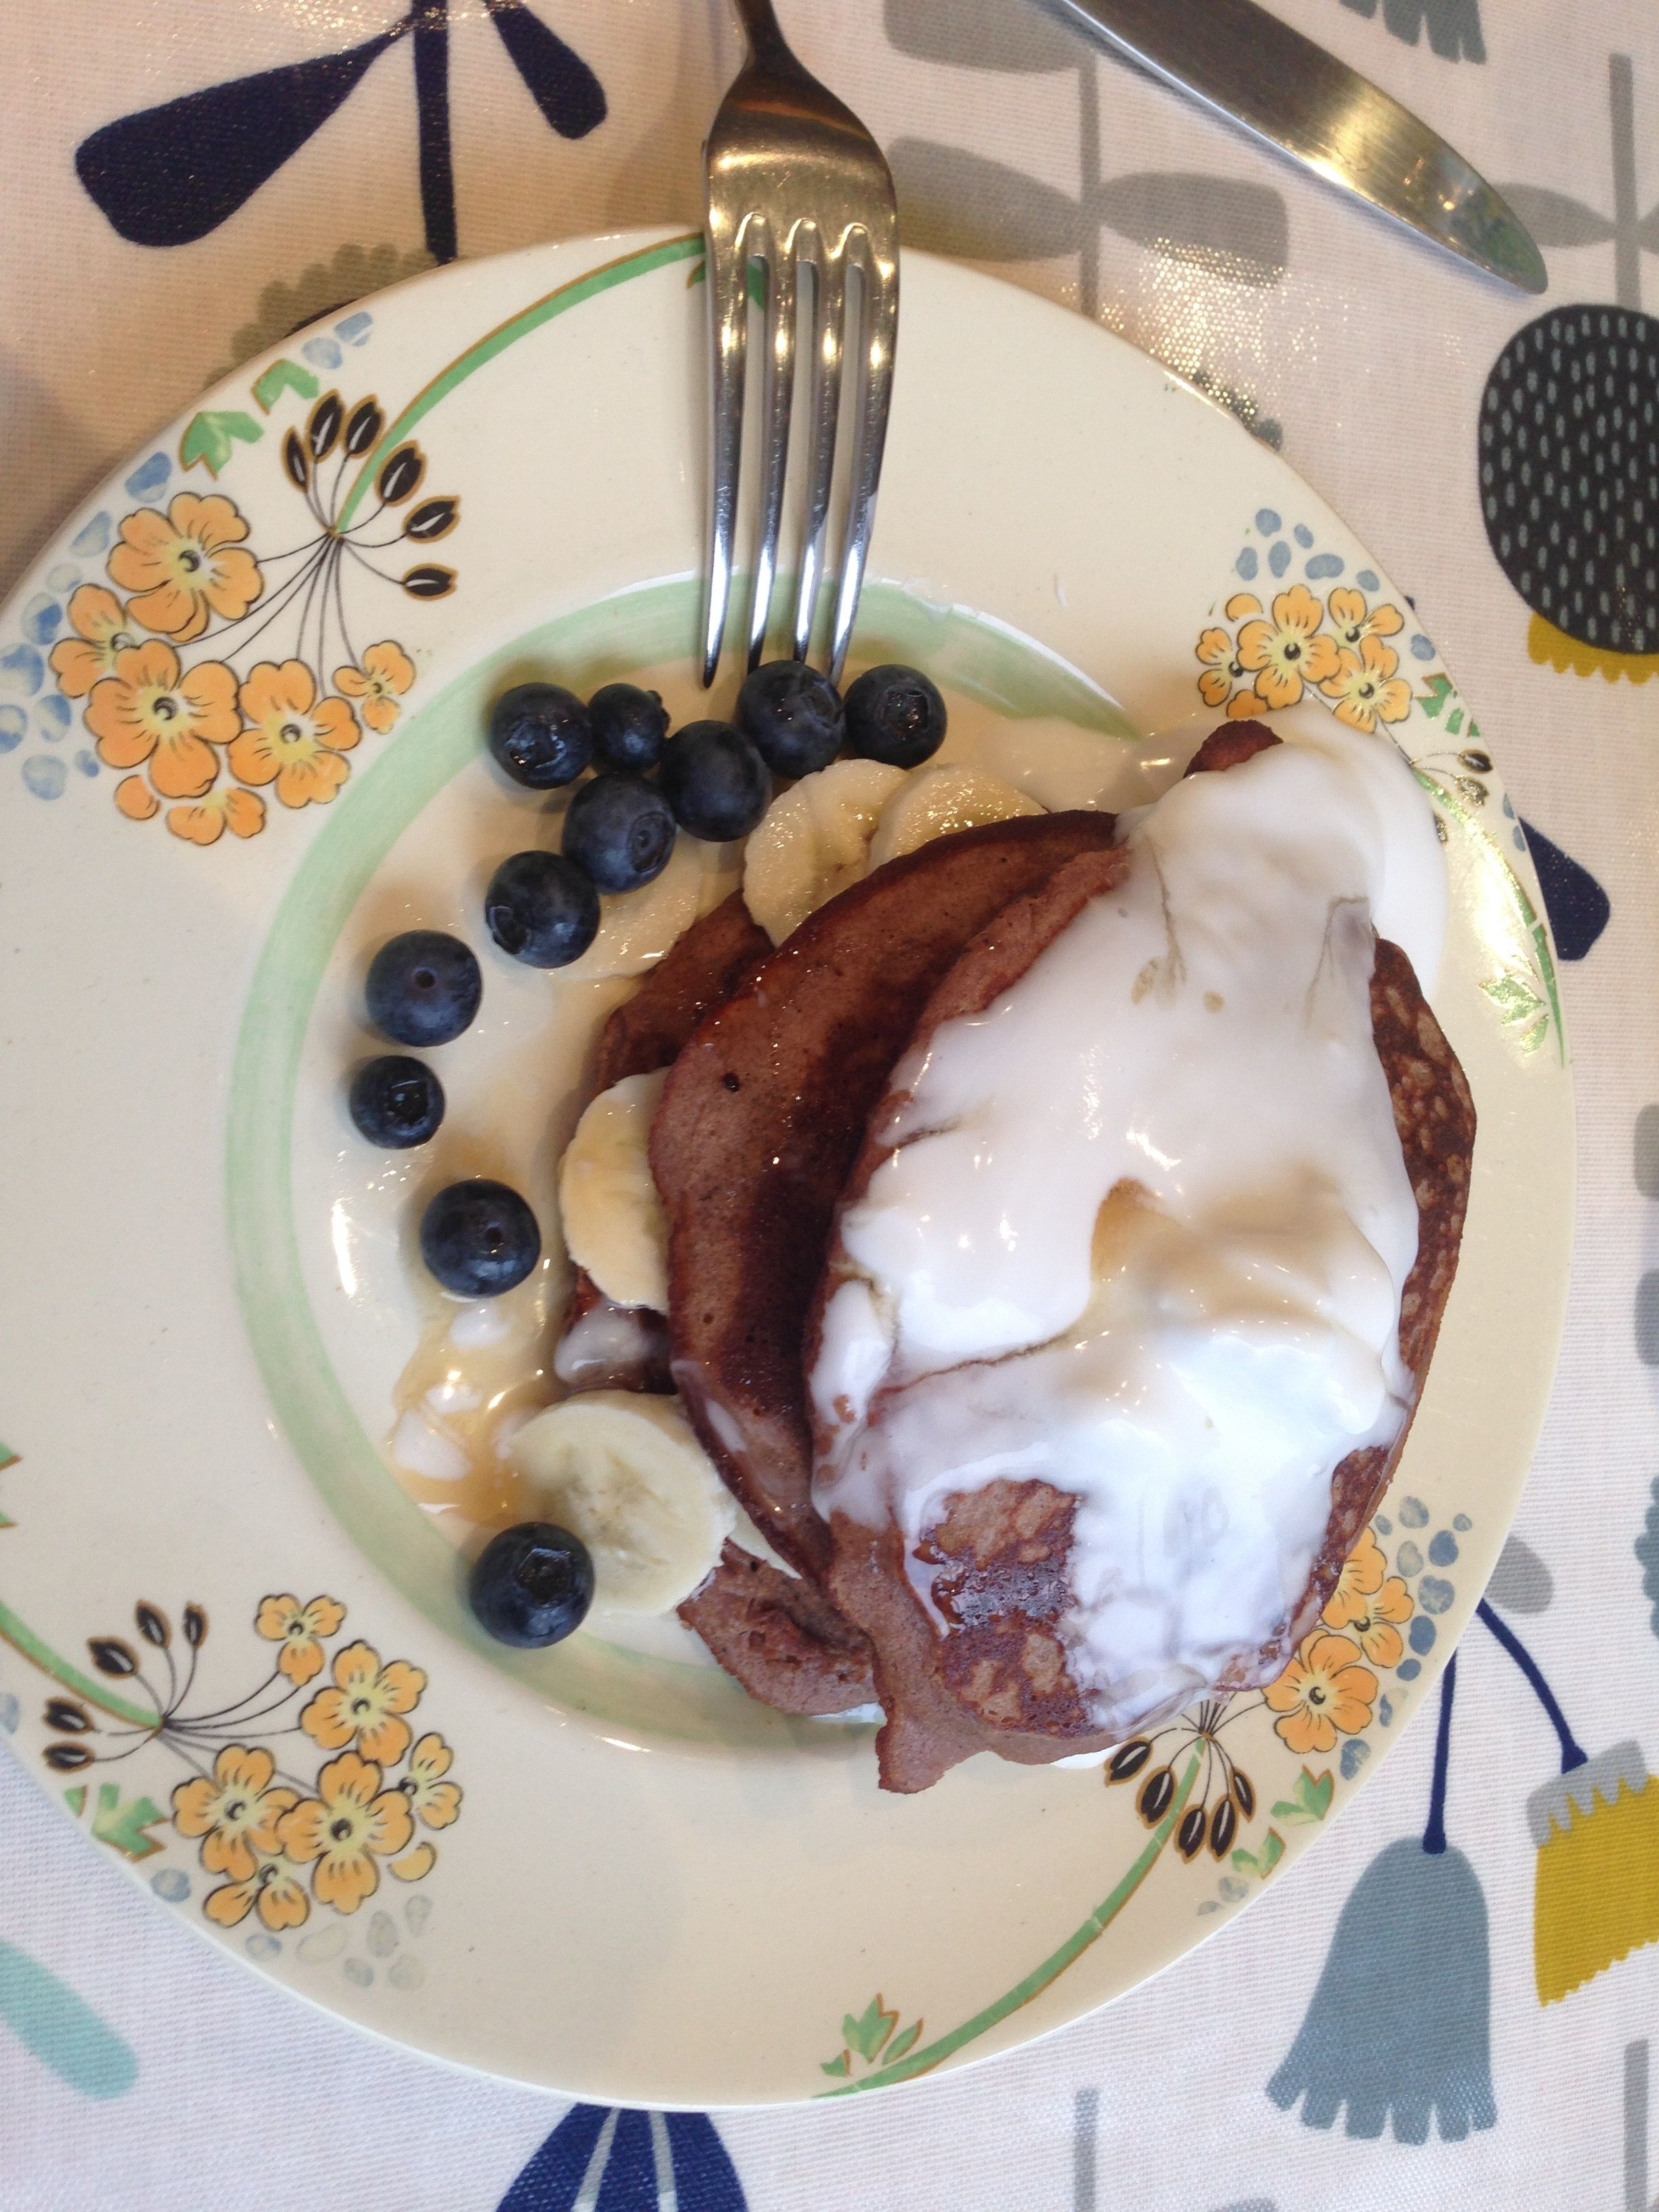 Chesnut flour pancakes with banana, blueberries, coconut yogurt and maple syrup .... yum.